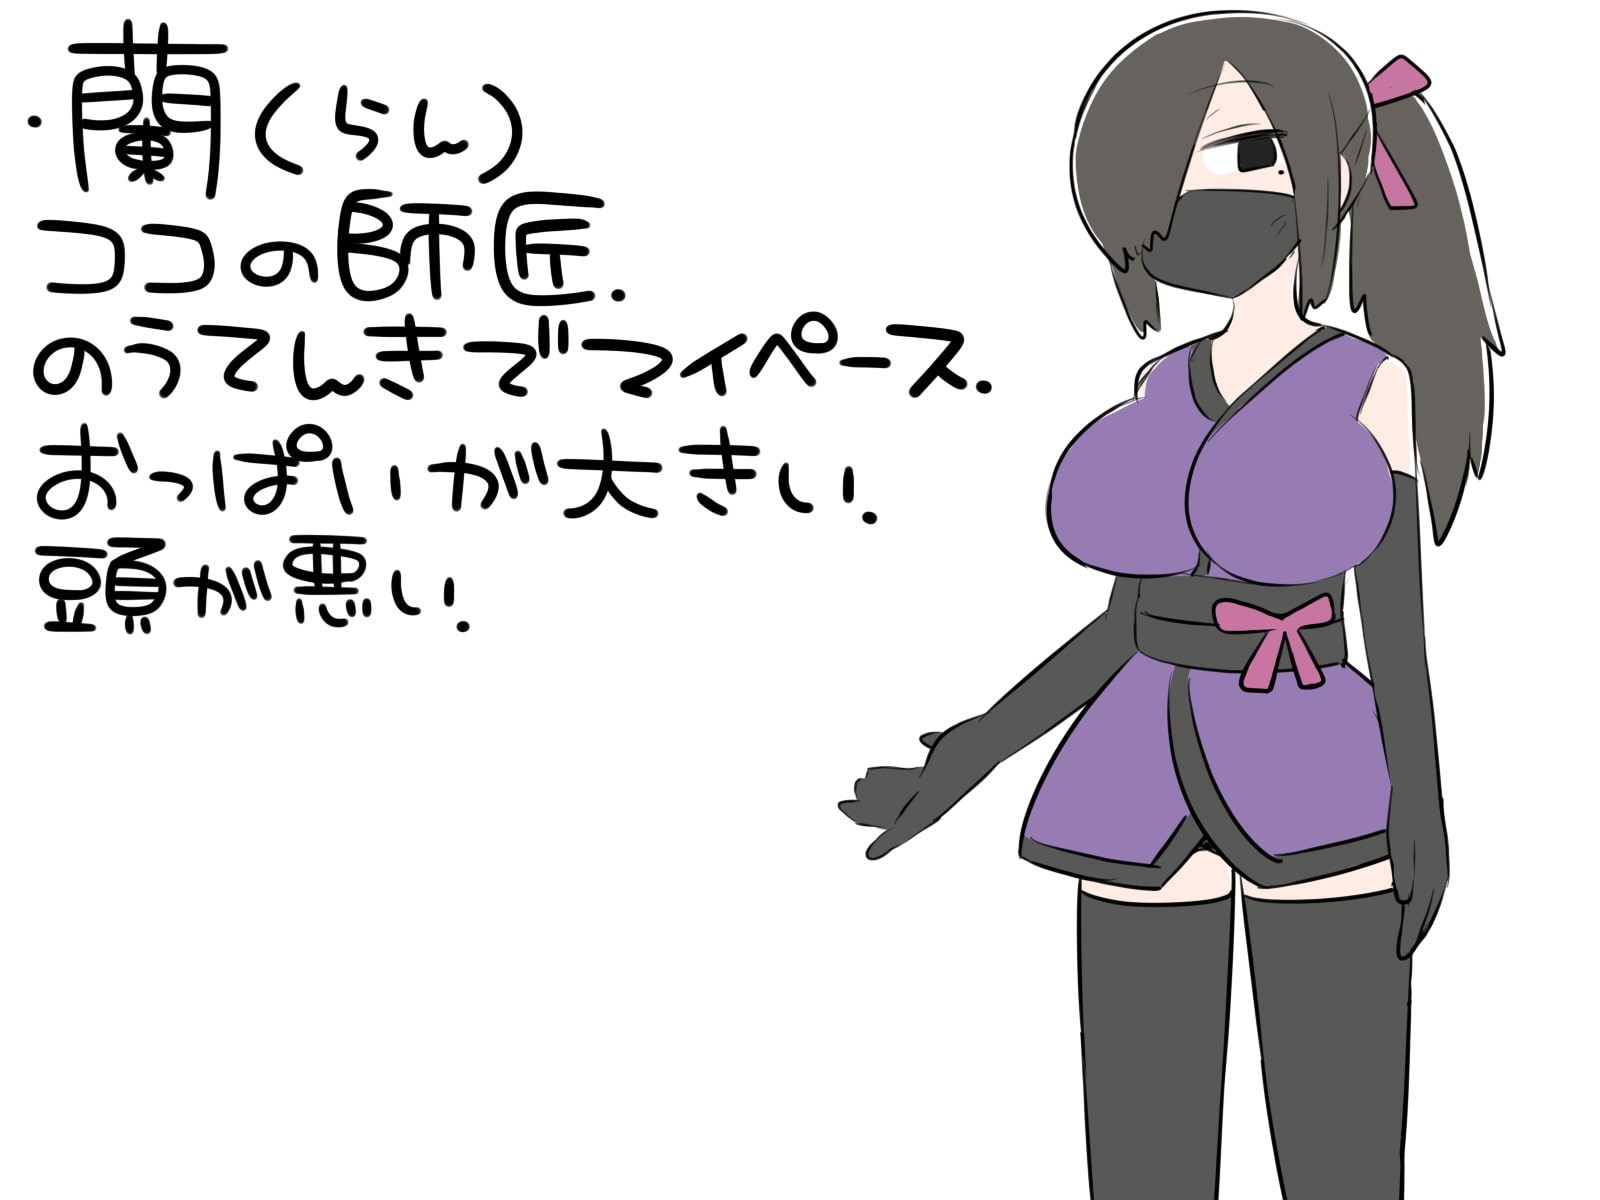 RJ329594 おちんコン [20210601]